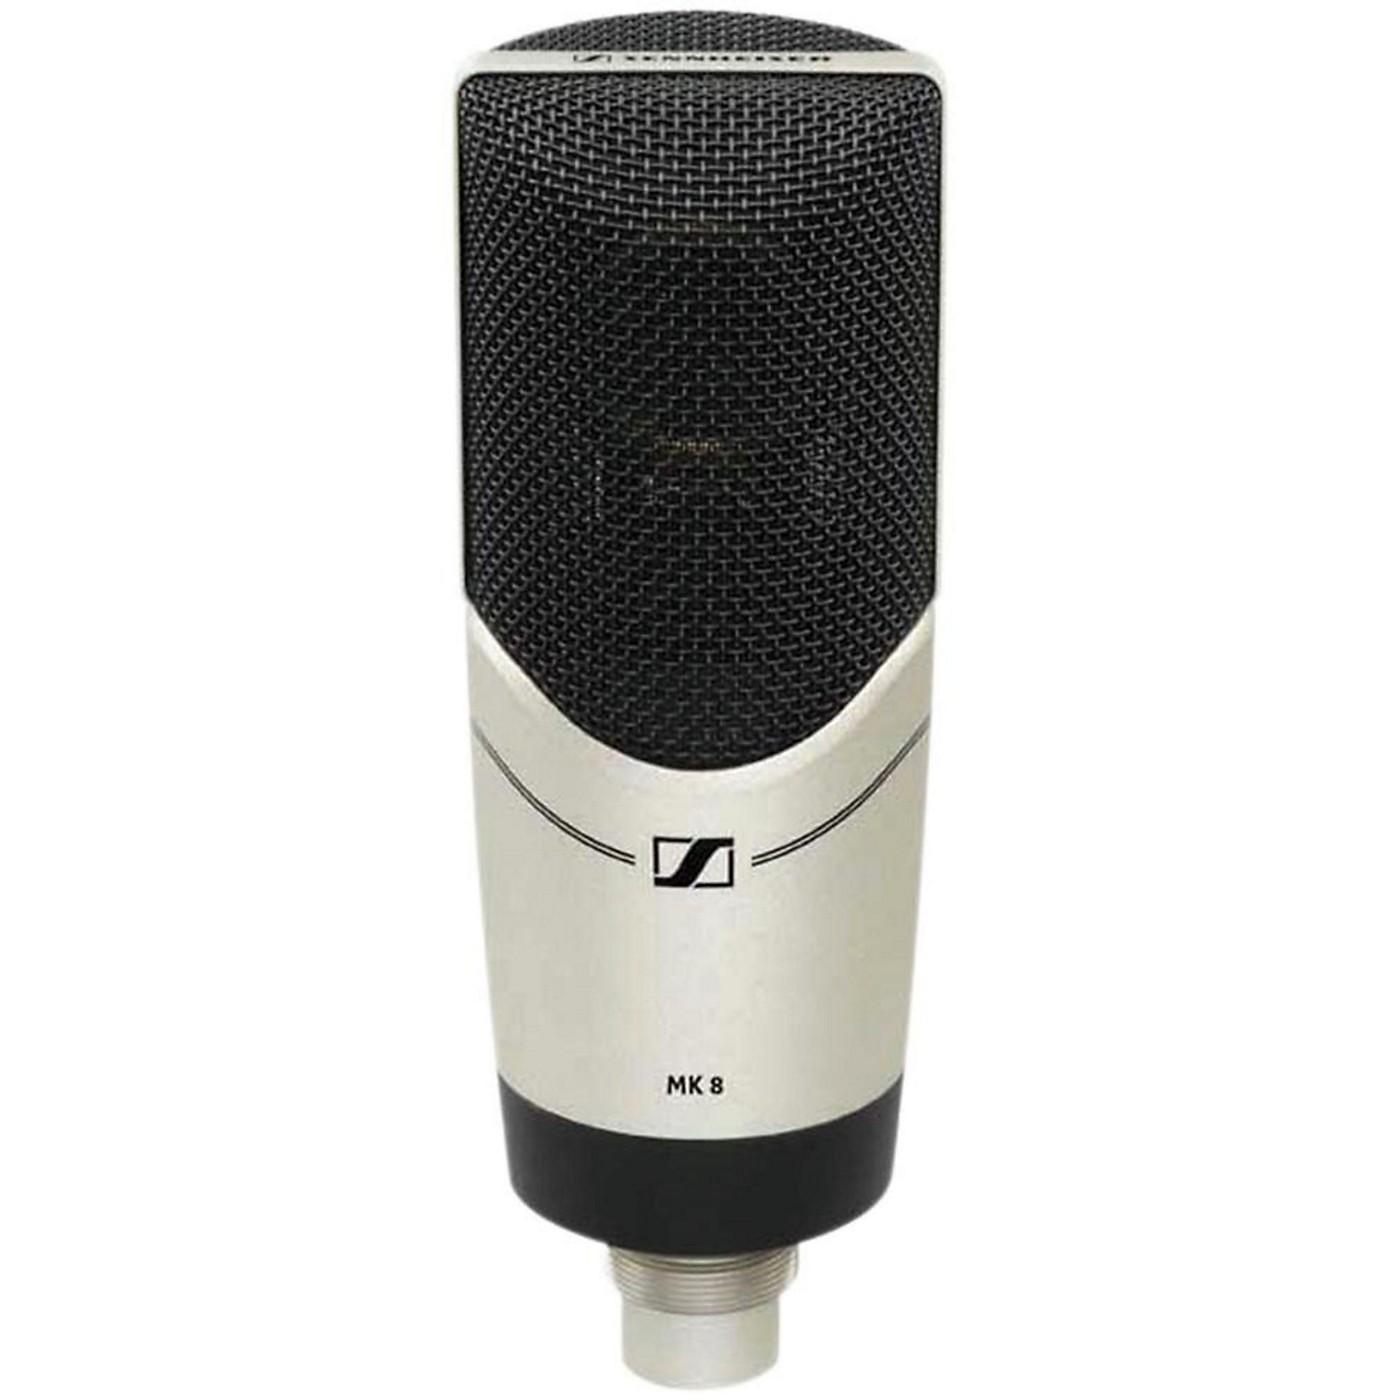 Sennheiser MK 8 Multi-Pattern Large Diaphragm Condenser Microphone thumbnail